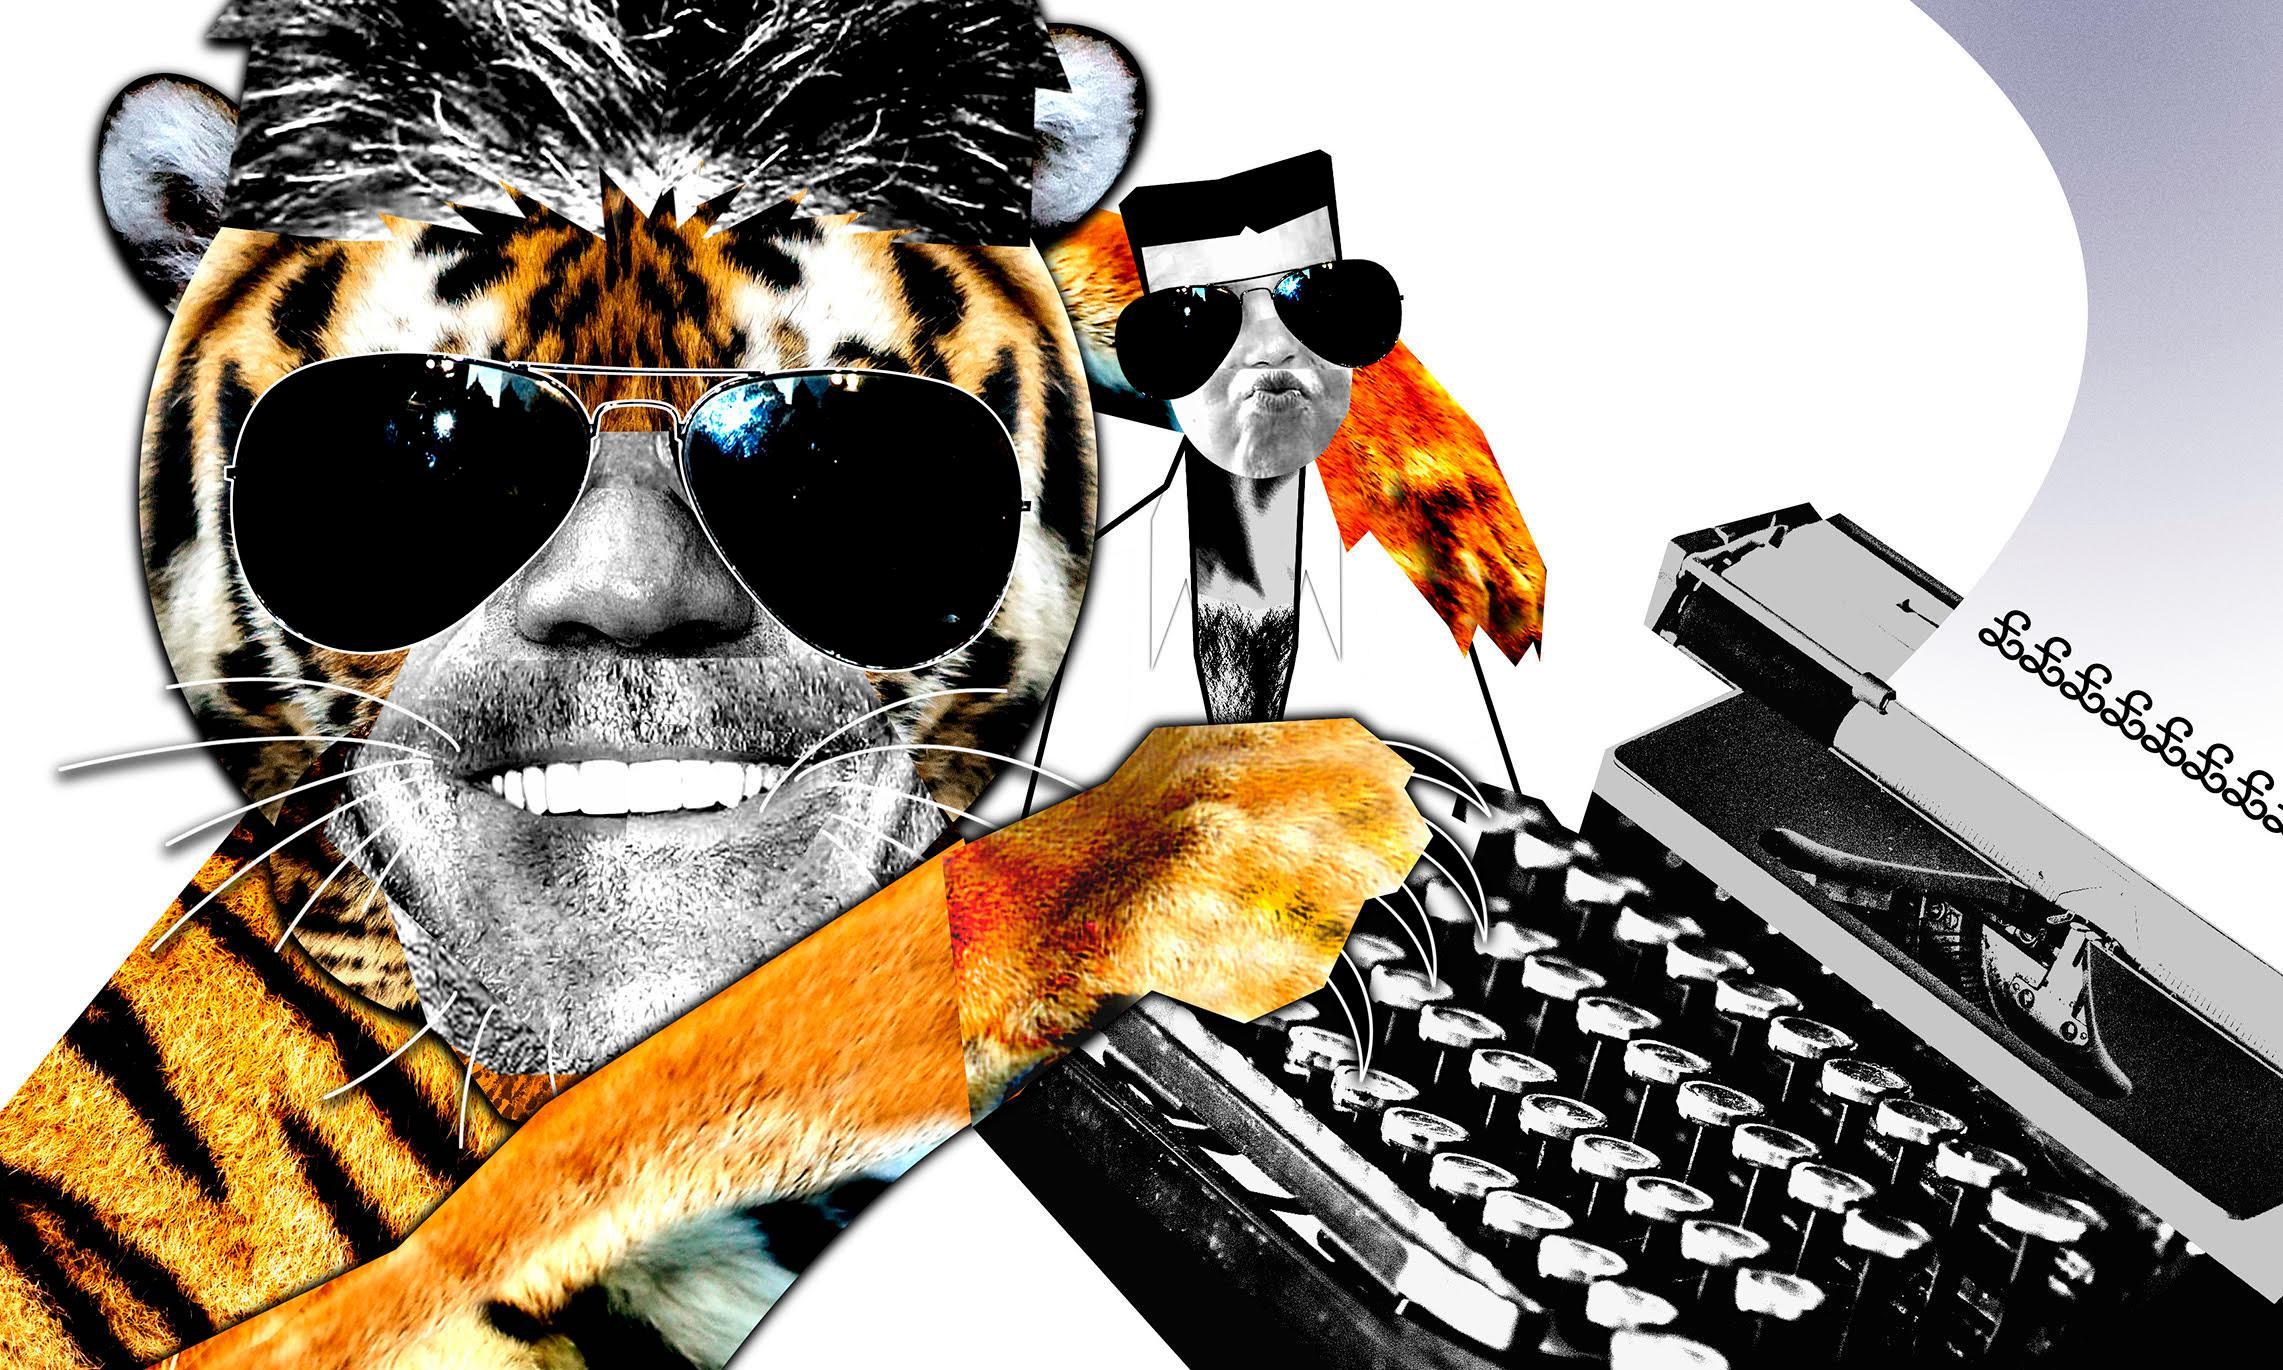 Cowell & Son: meet the literary world's latest sensation